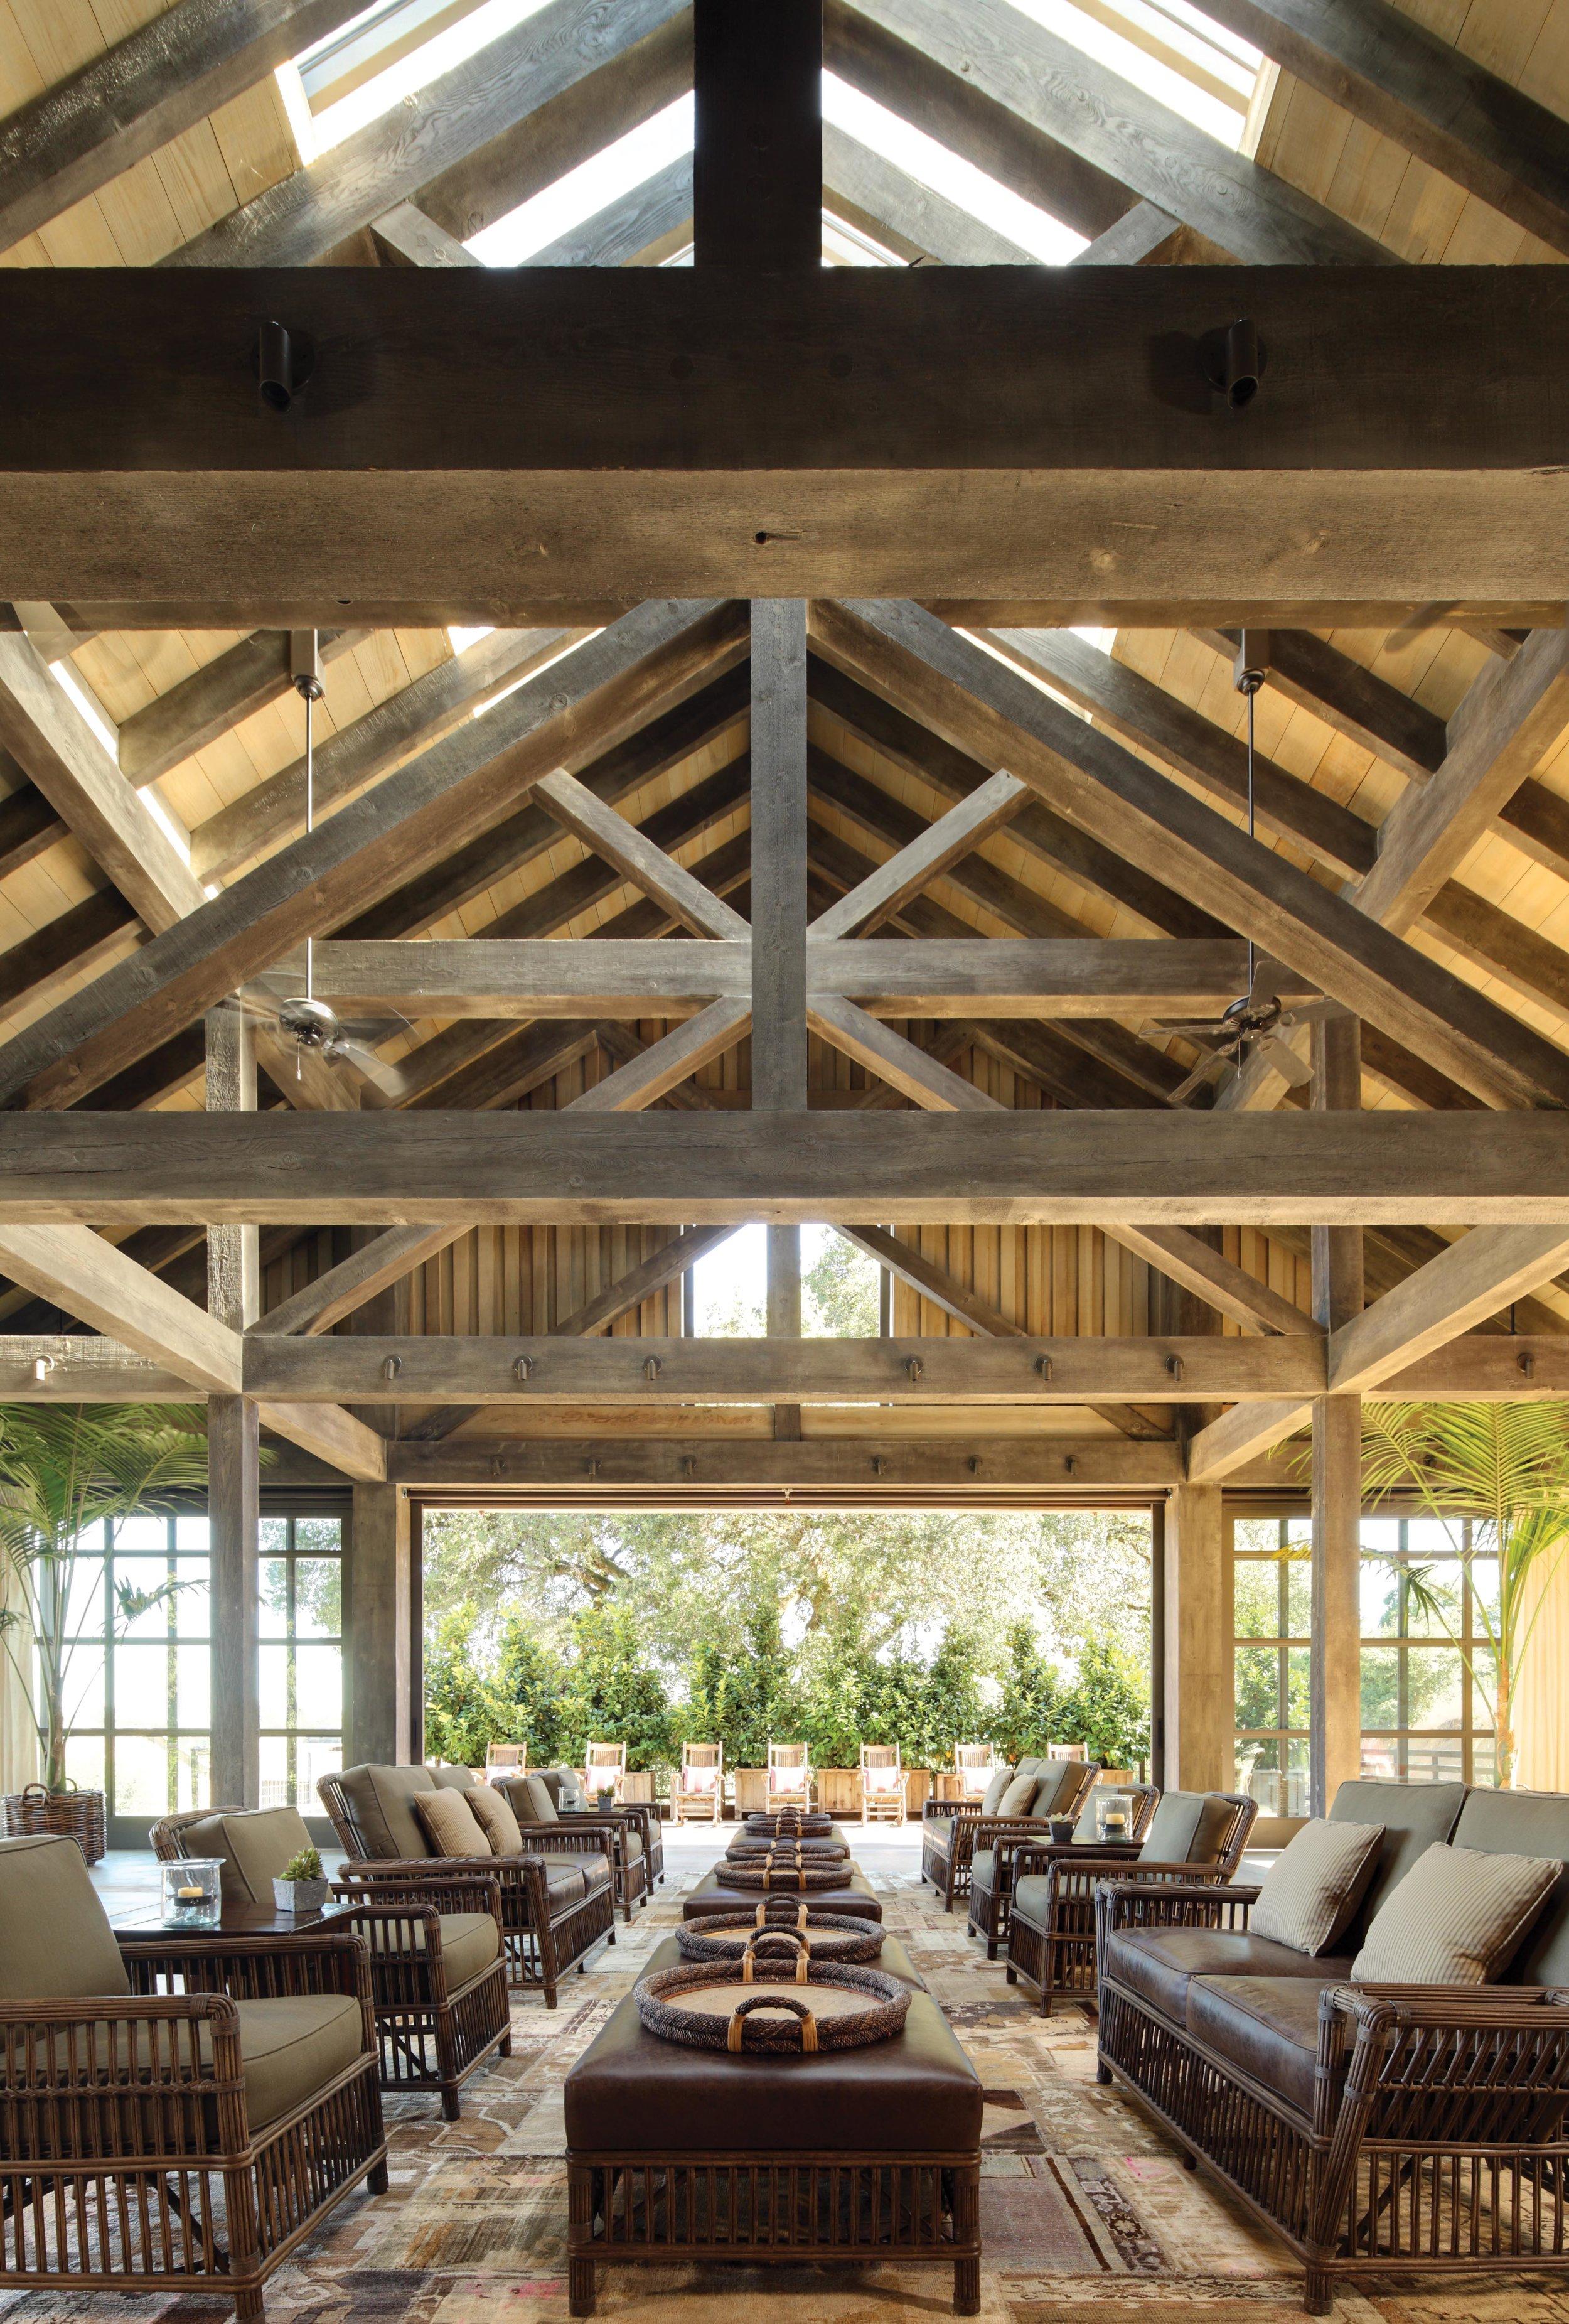 Napa Valley, Reserve, Backen & Gillam Architects